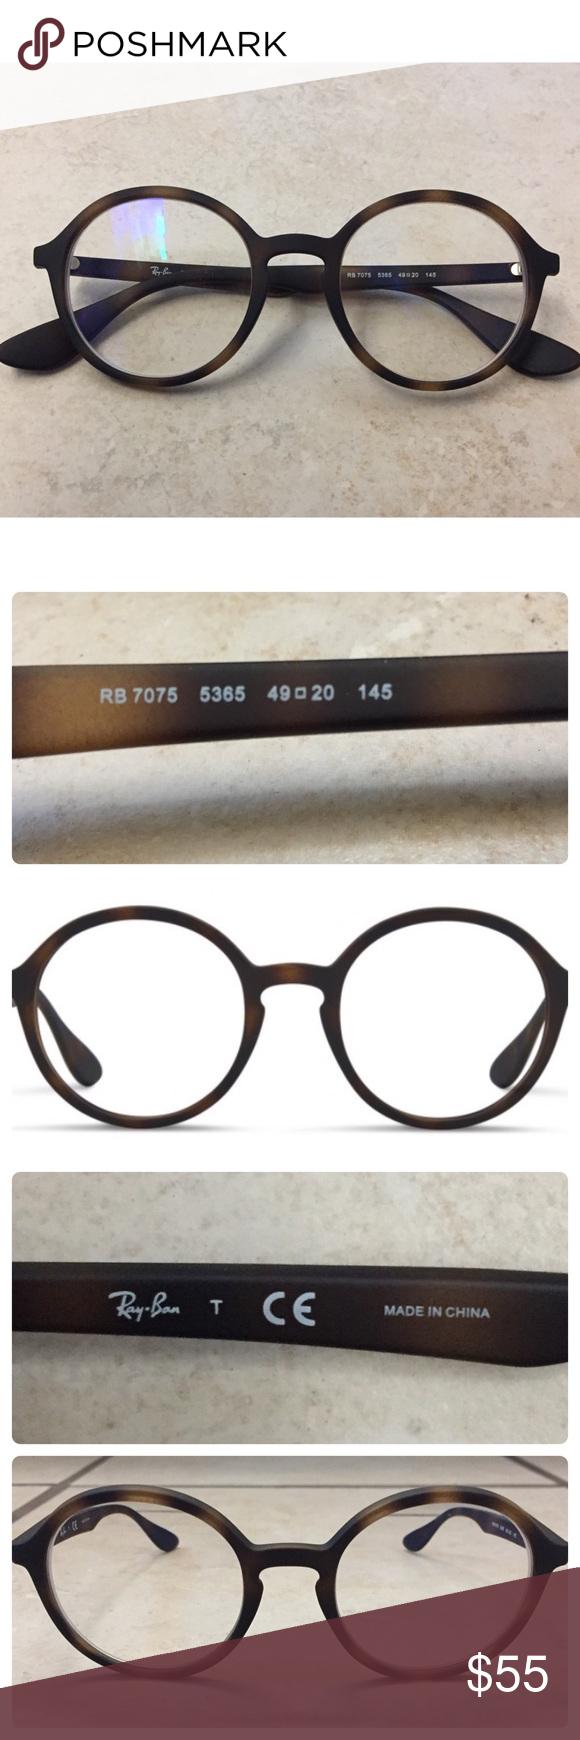 a449e422a70 Ray-Ban Authentic Trendy Circular 7075 Glasses Ray-Ban Authentic Trendy  Circular 7075 5365